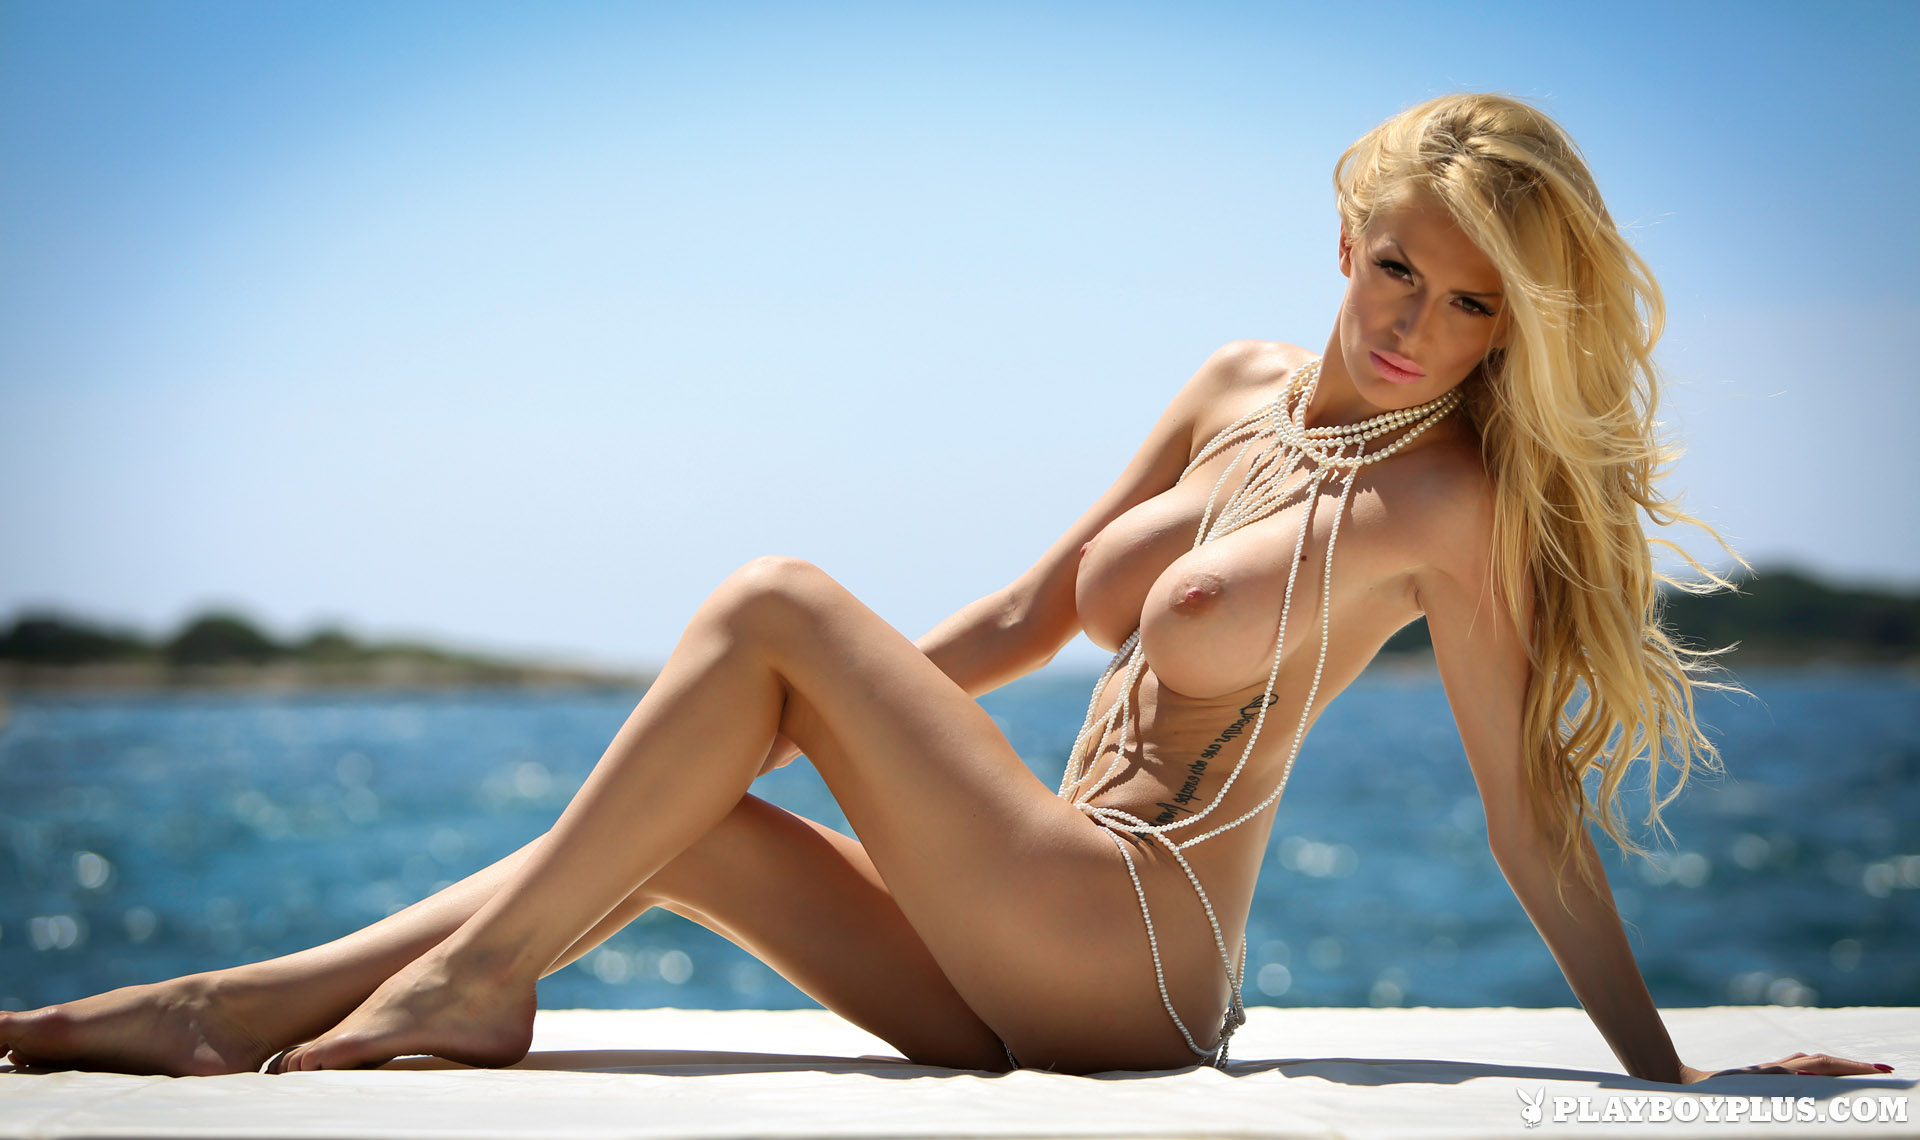 bozana-vujinovic-nude-boobs-blonde-croatia-playboy-03